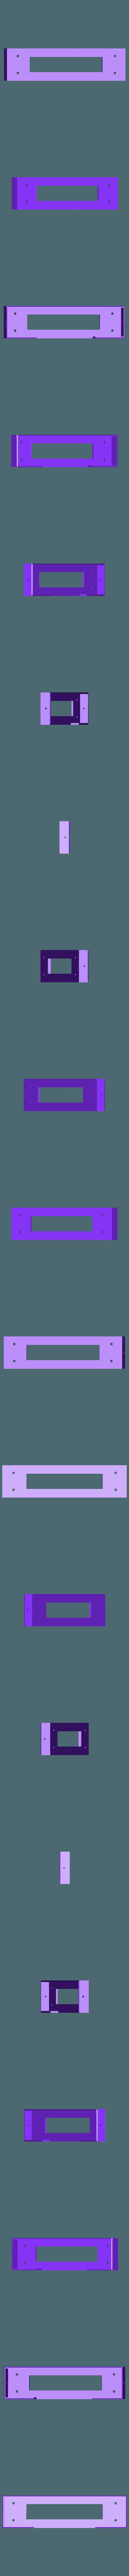 FRENTE_tapa.STL Download free GCODE file control panel for cnc grbl • 3D printable model, franhabas